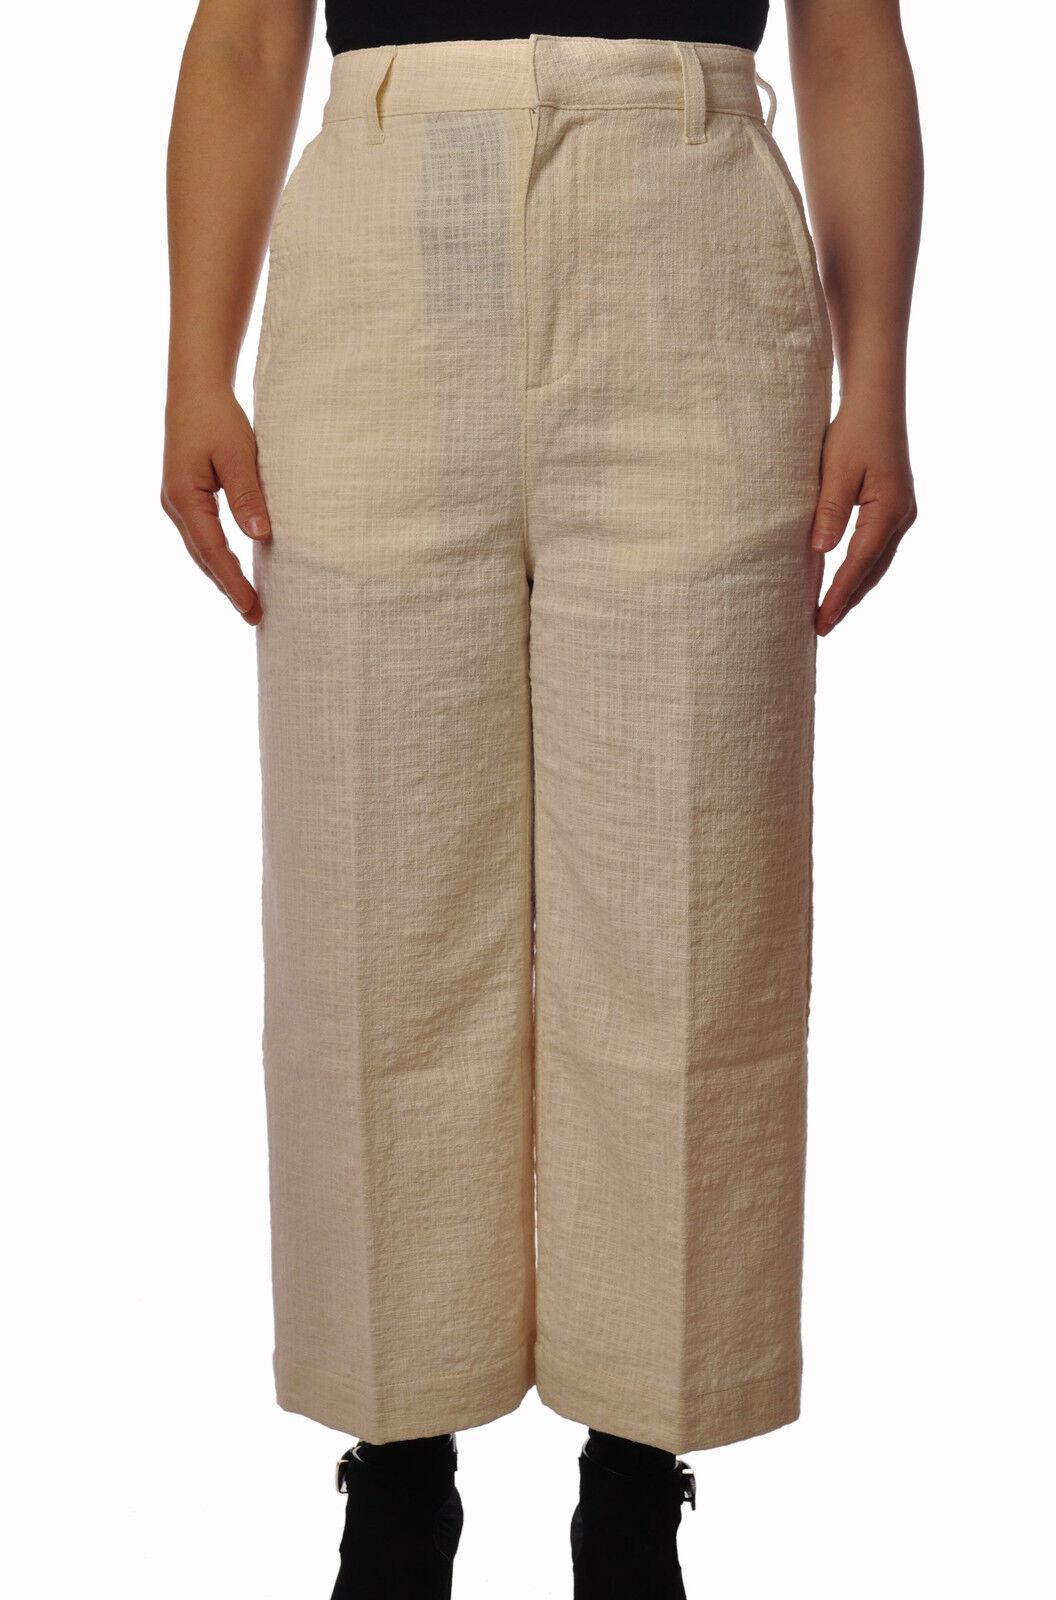 Department 5  -  Pants - Female - Beige - 3674725A184811